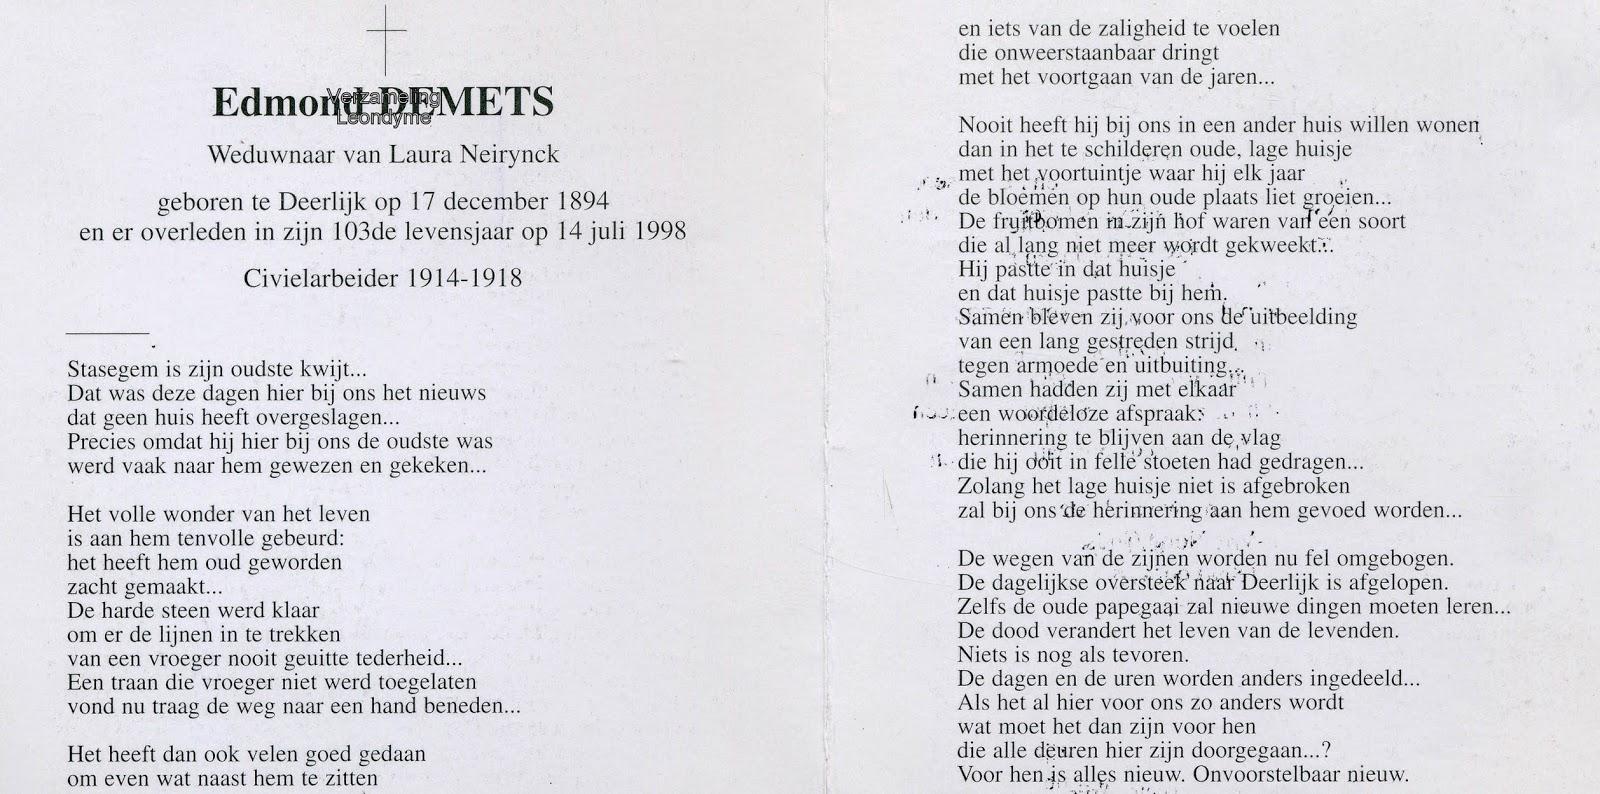 Bidprentje, Edmond Demets 1894-1998. Verzameling Leondyme